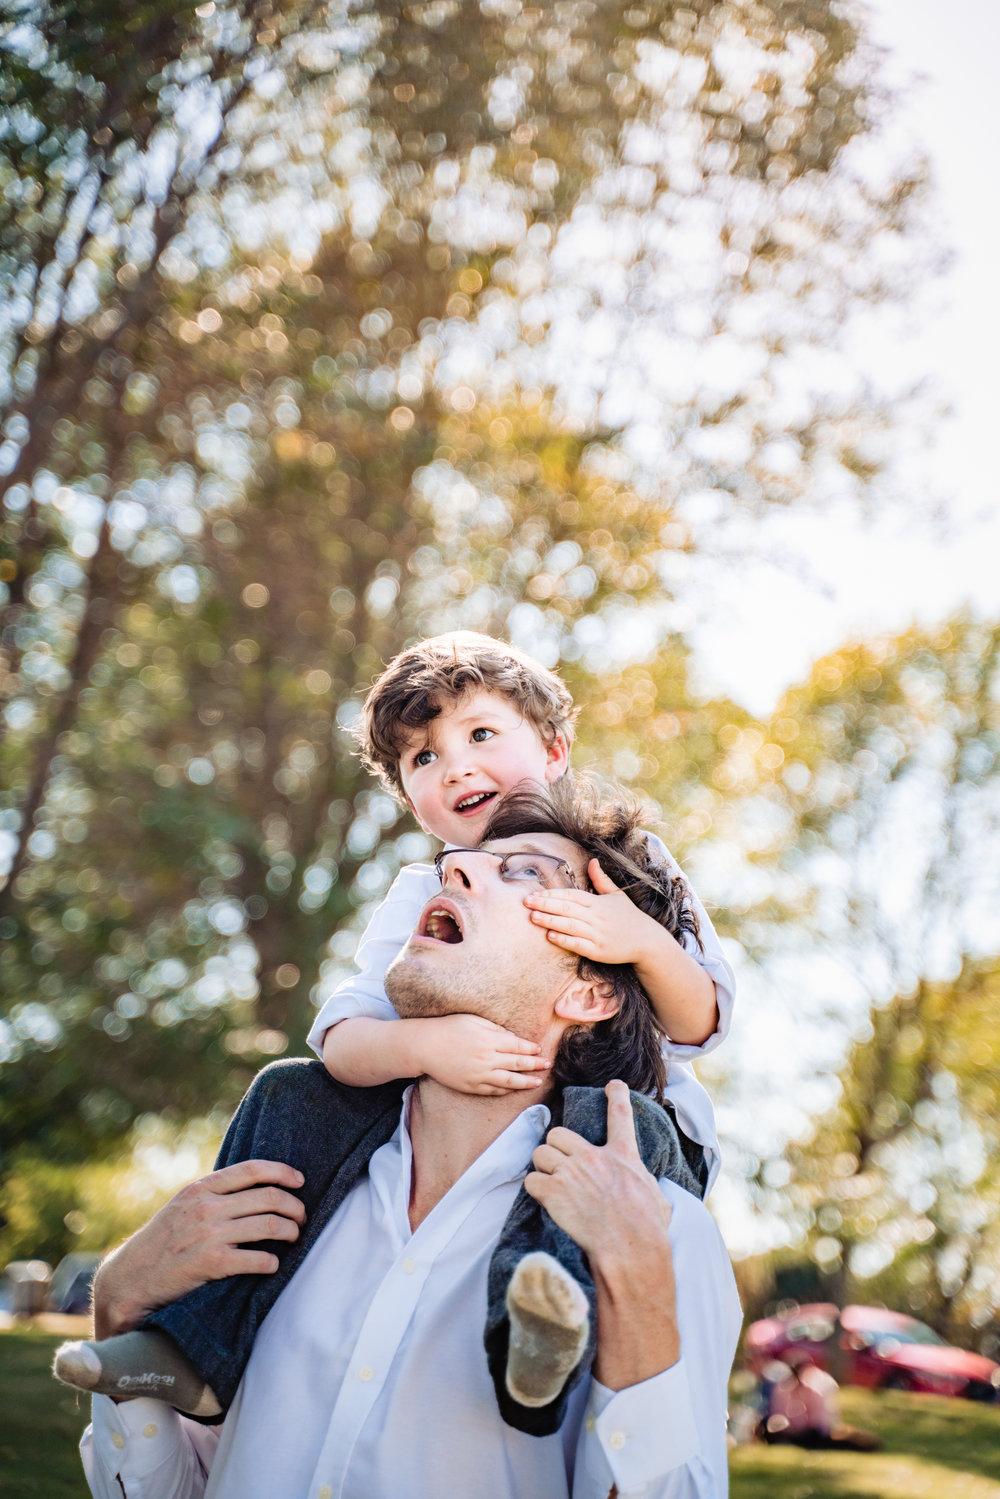 Halifax-wedding-photography-fall-photographers-novascotia-canada-ottawa (98 of 113).jpg